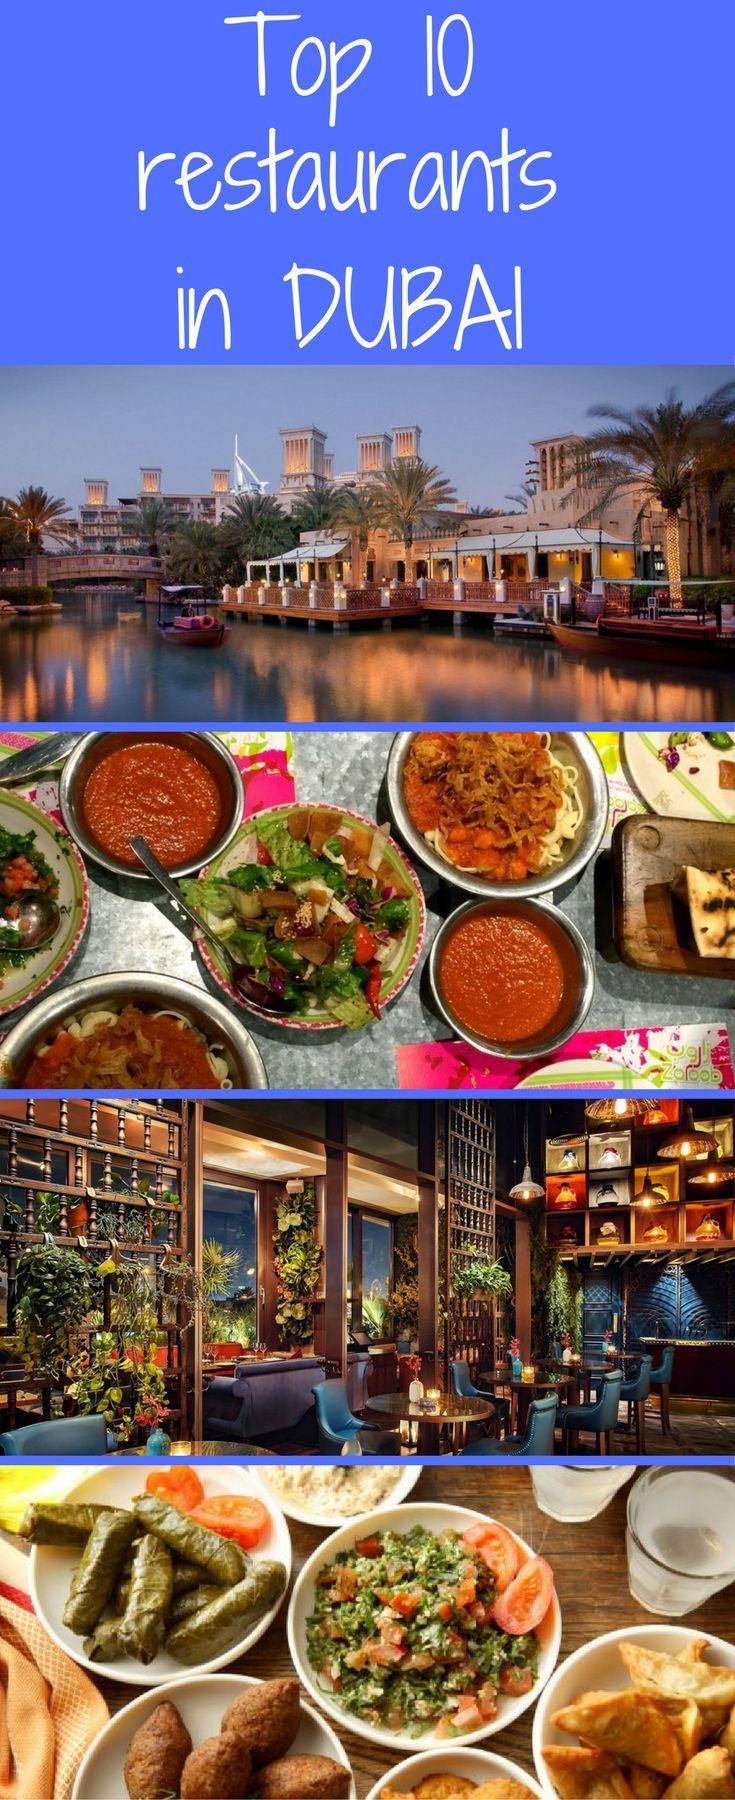 Dubai Restaurants Dubai vacation, Best restaurants in